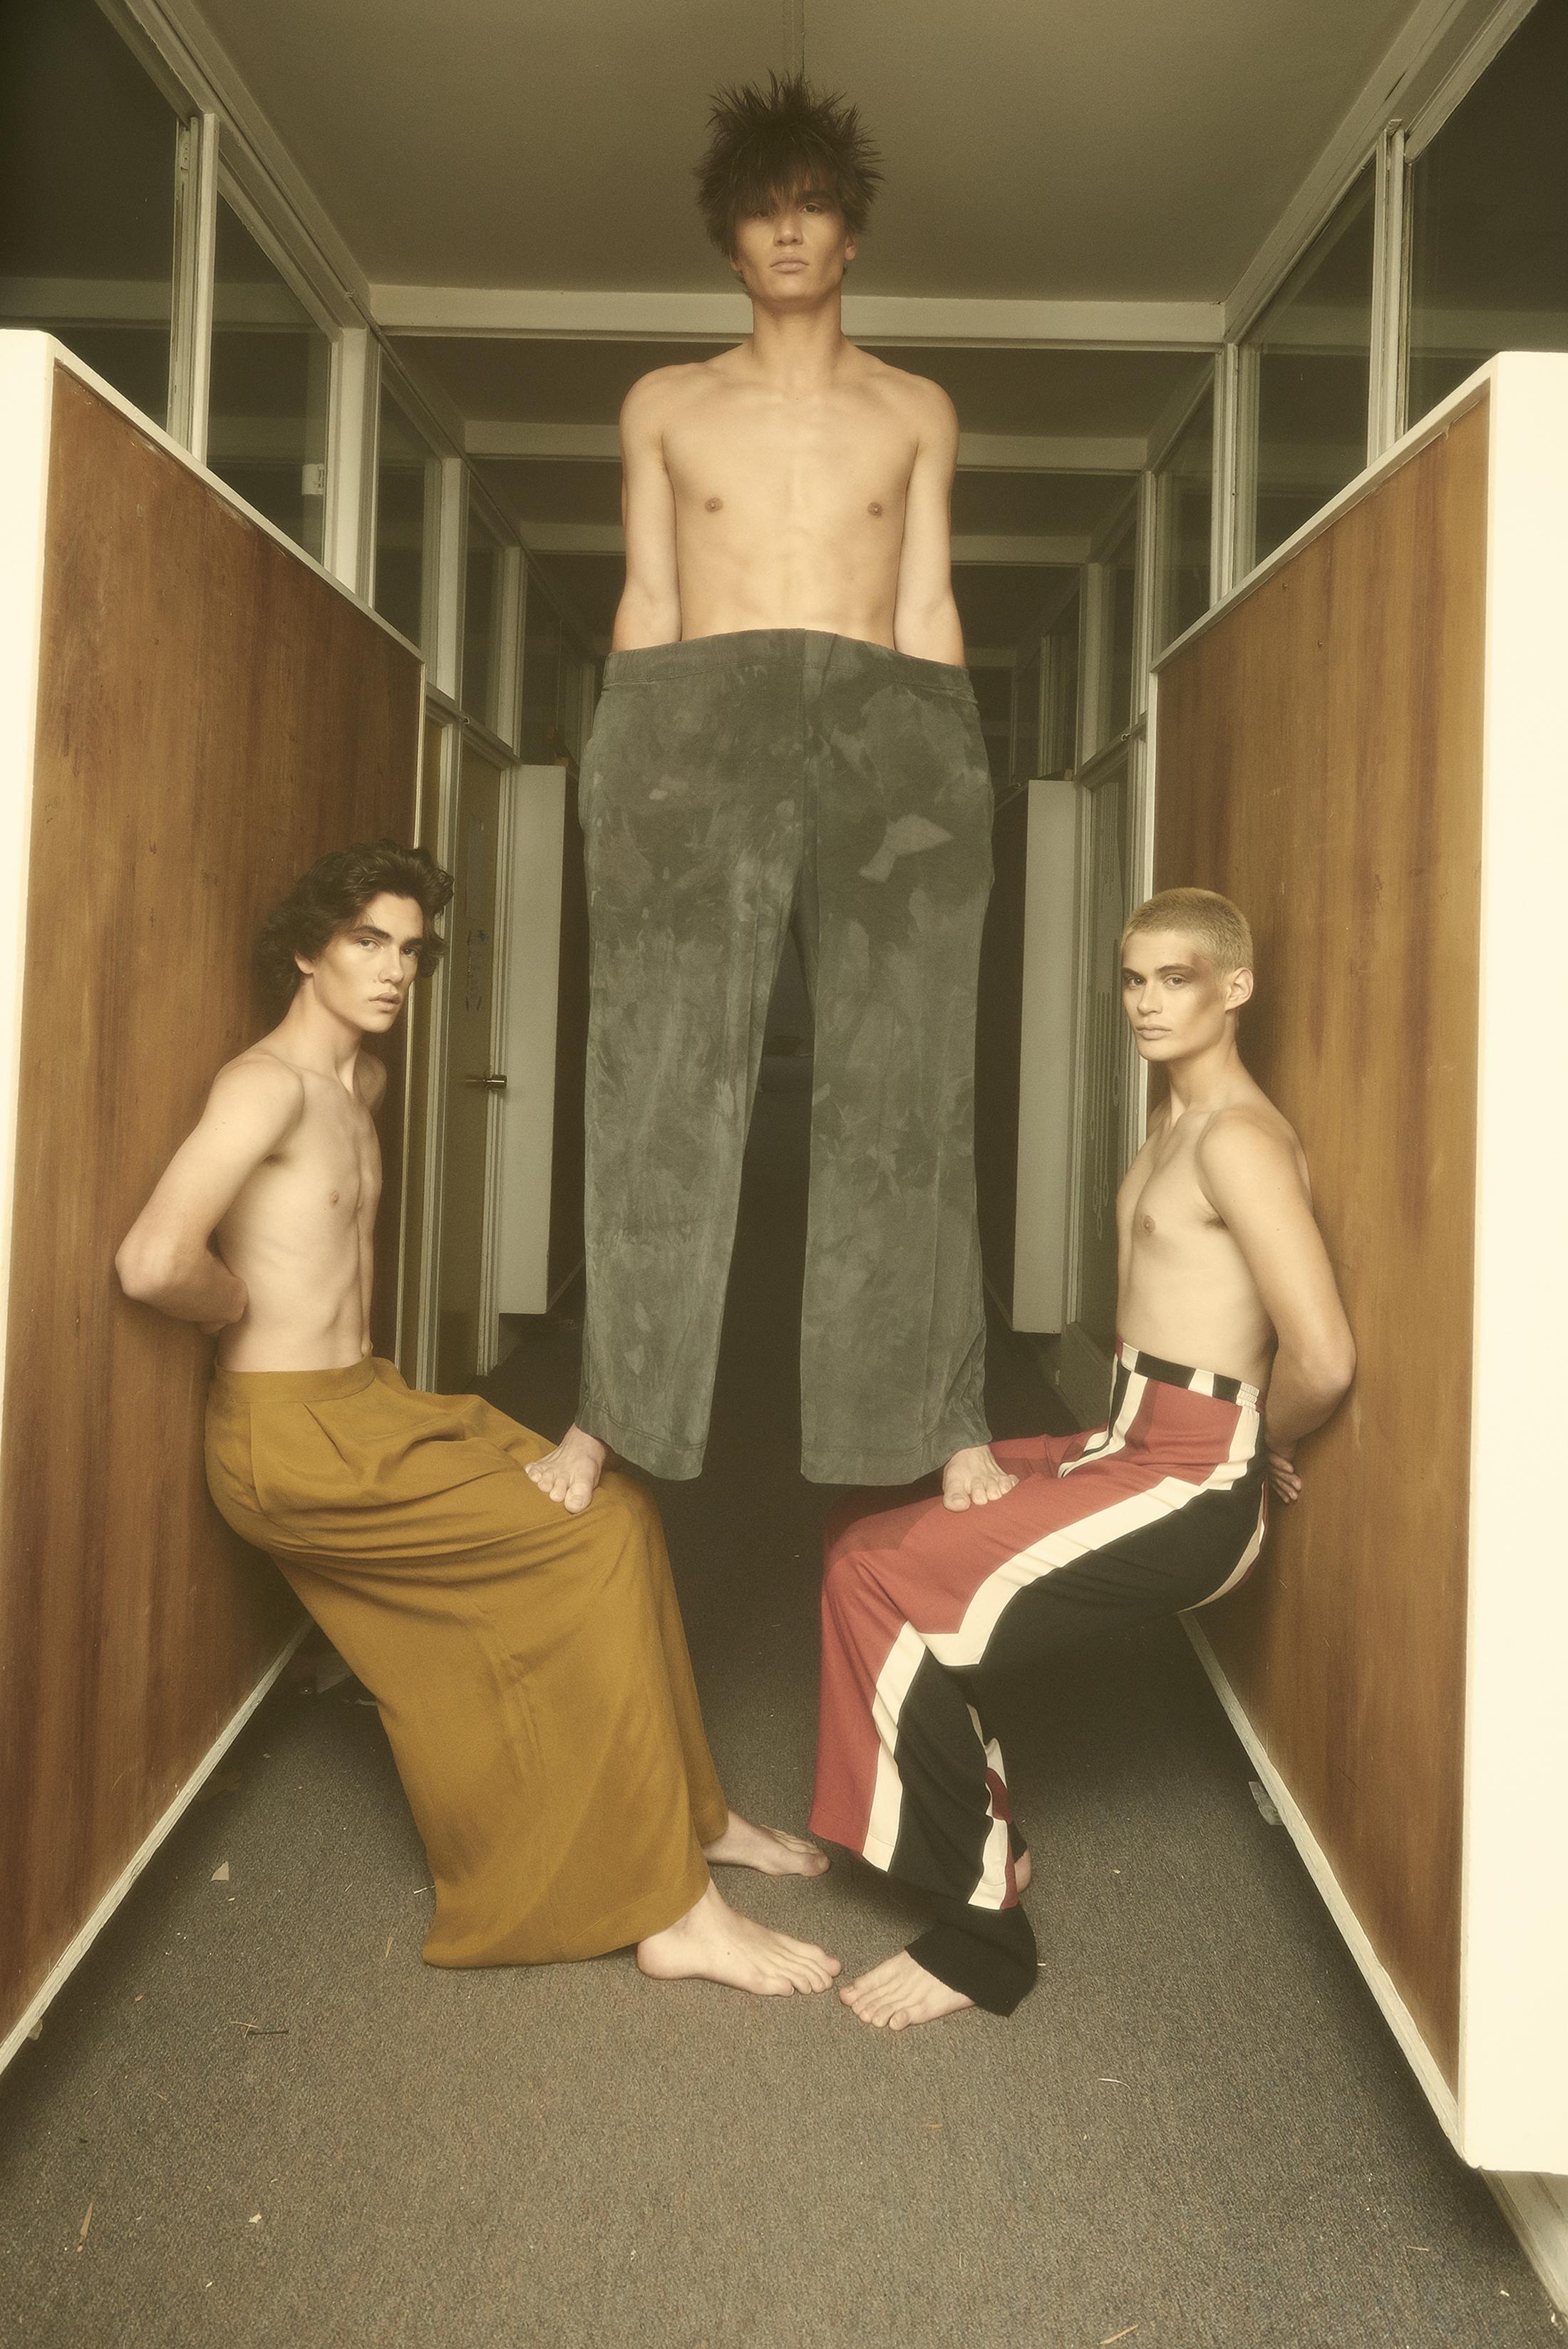 Davor viste pantalones de ADEANTONIO. Germán viste pantalones de SISA. Charly viste pantalones de CHER.